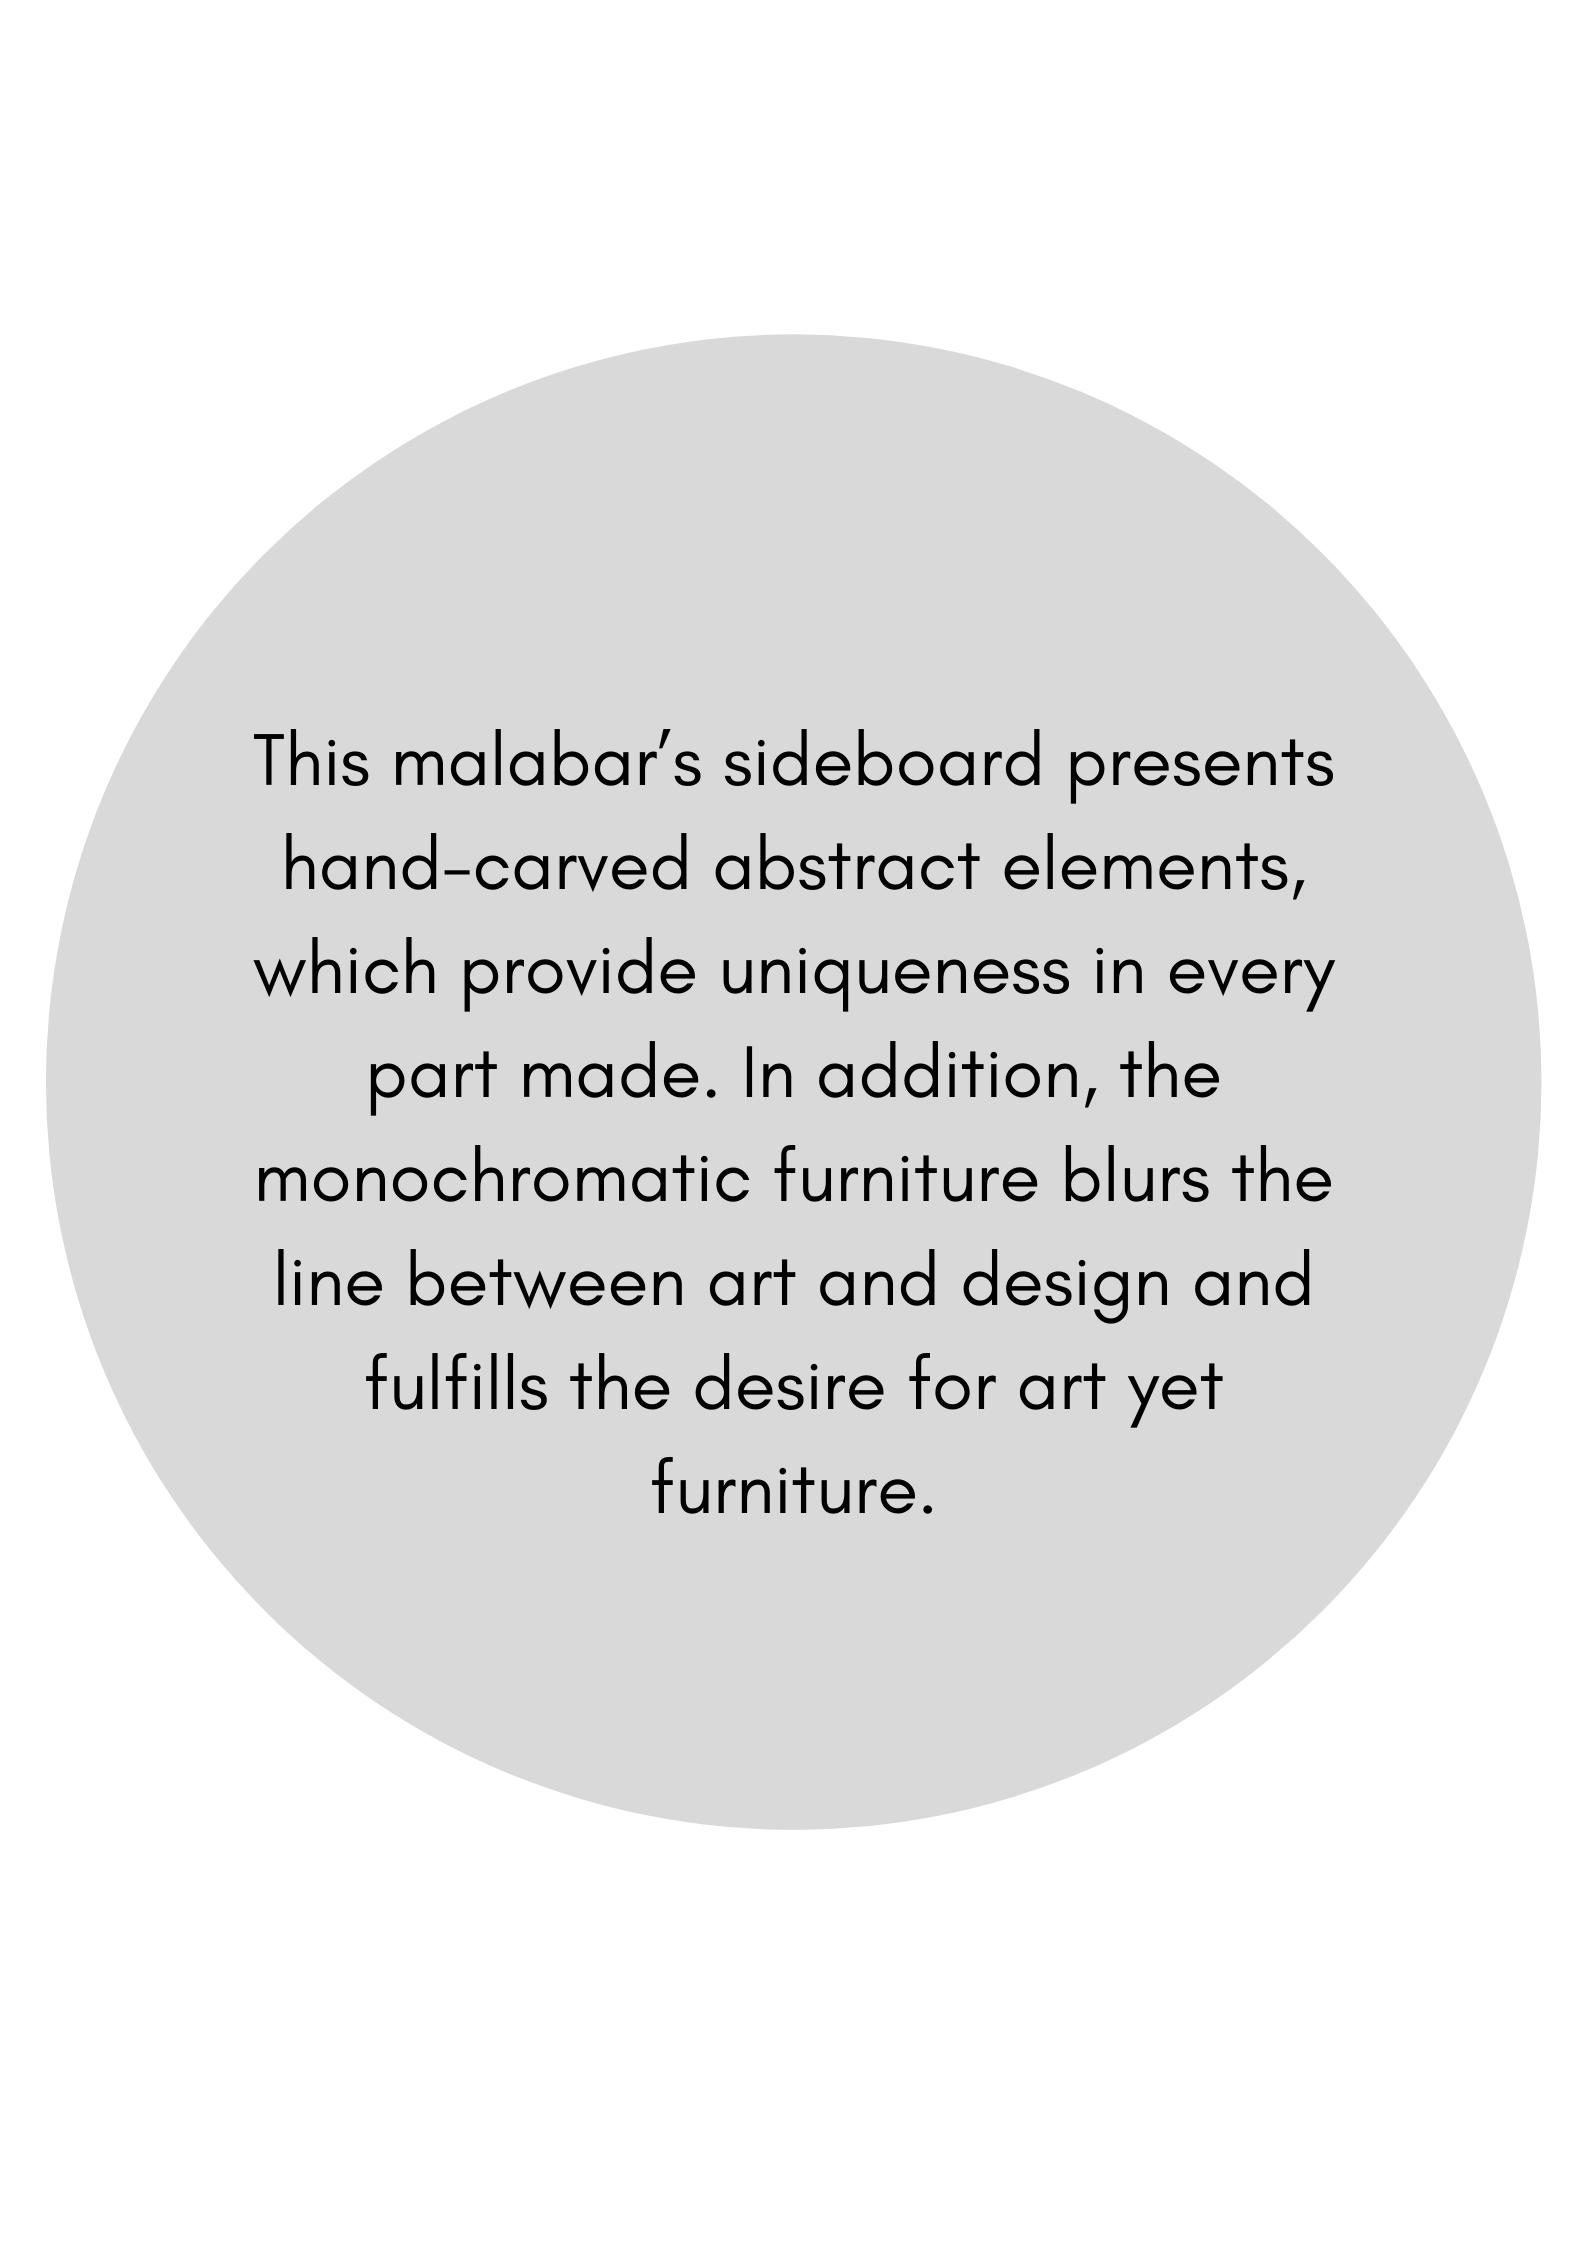 Art-inspired furniture